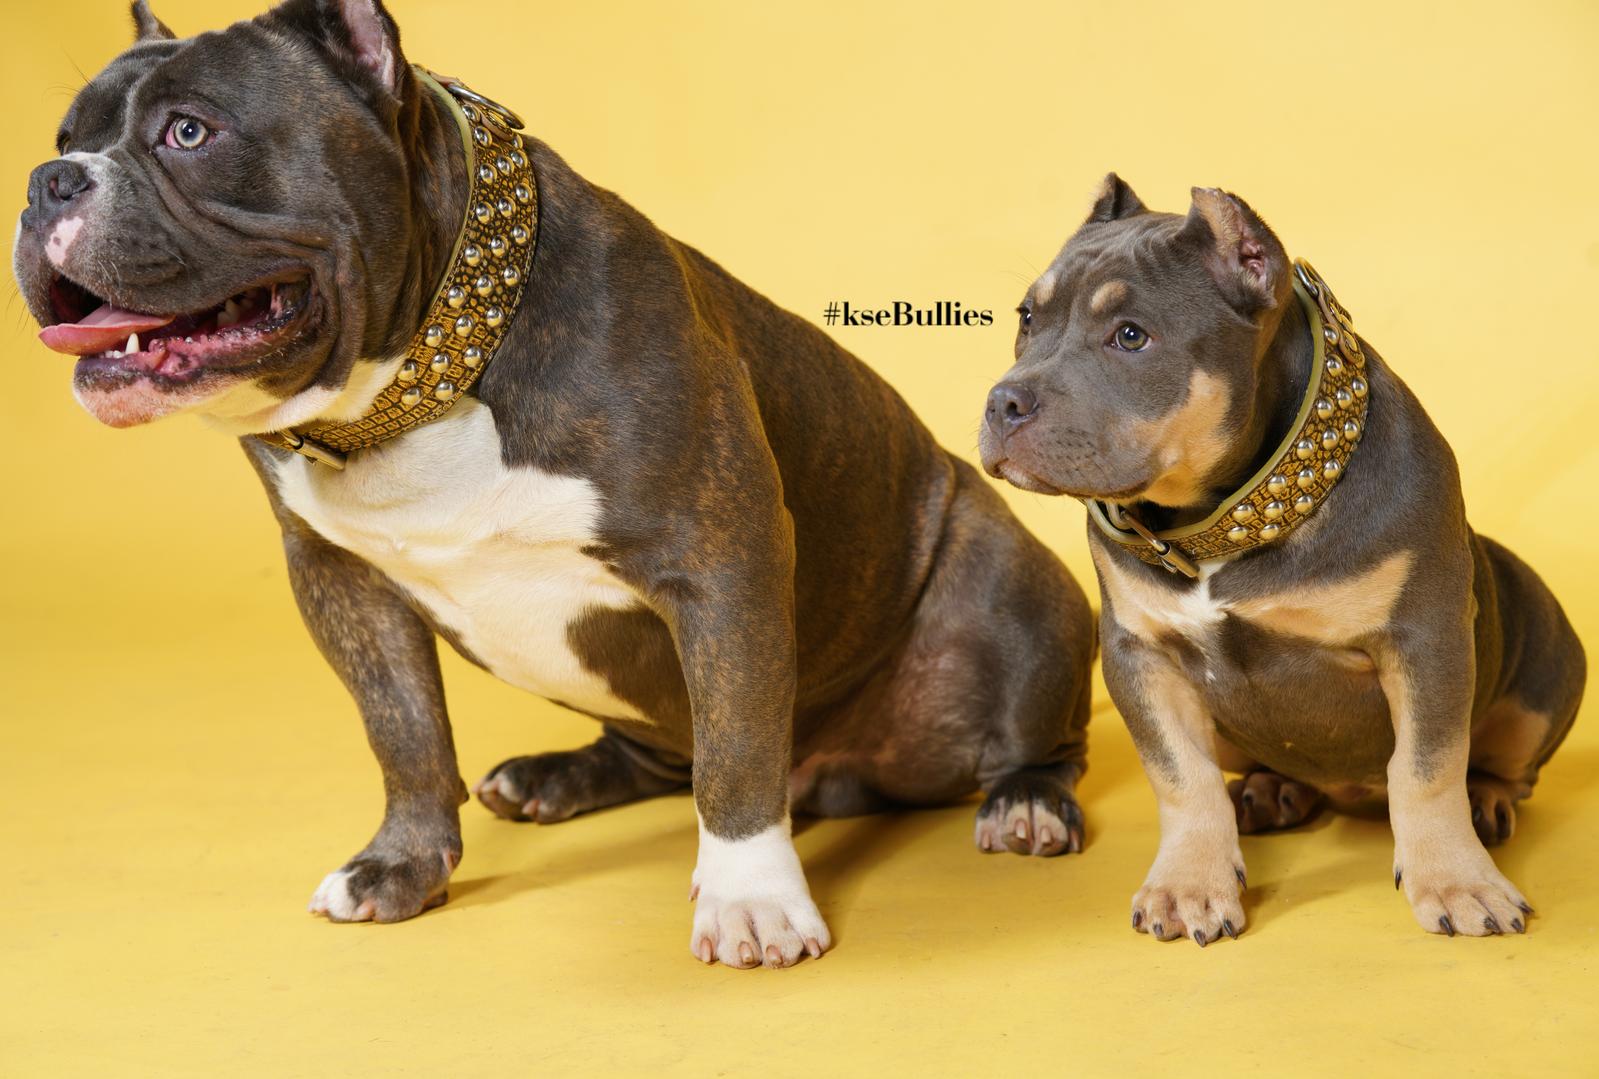 ksebullies peakyshelby king shelby exotic bullies american bully puppy in atlanta georgia bulldog